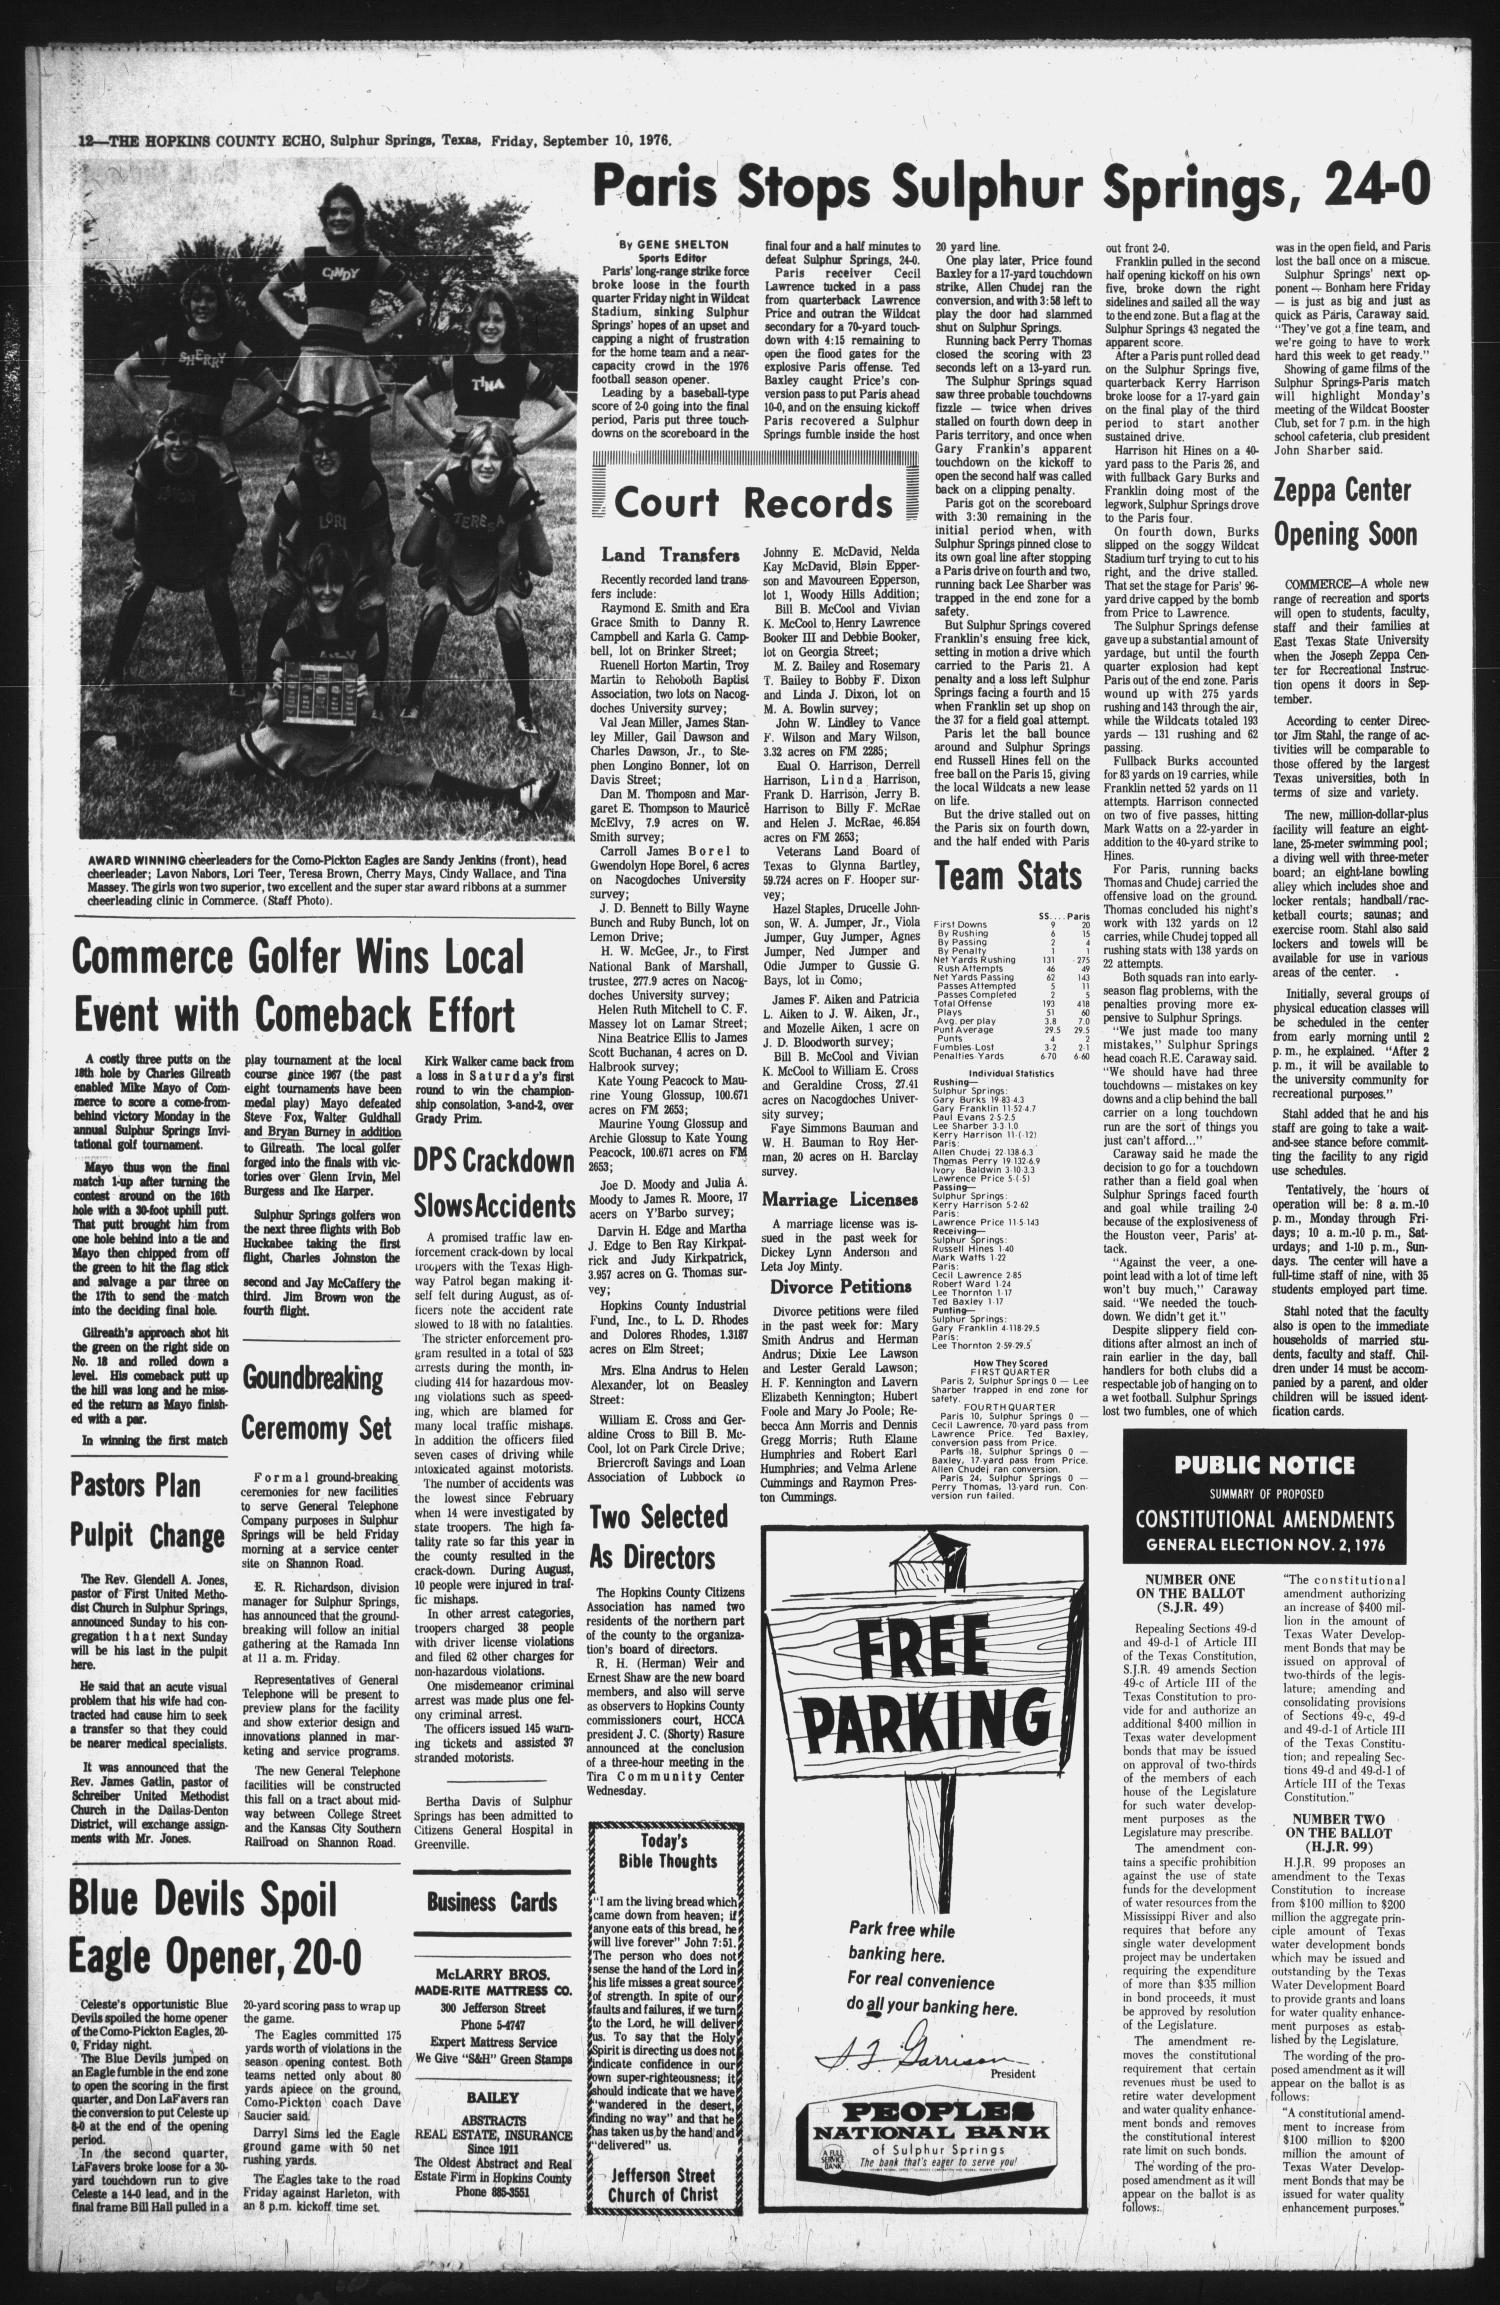 The Hopkins County Echo (Sulphur Springs, Tex ), Vol  101